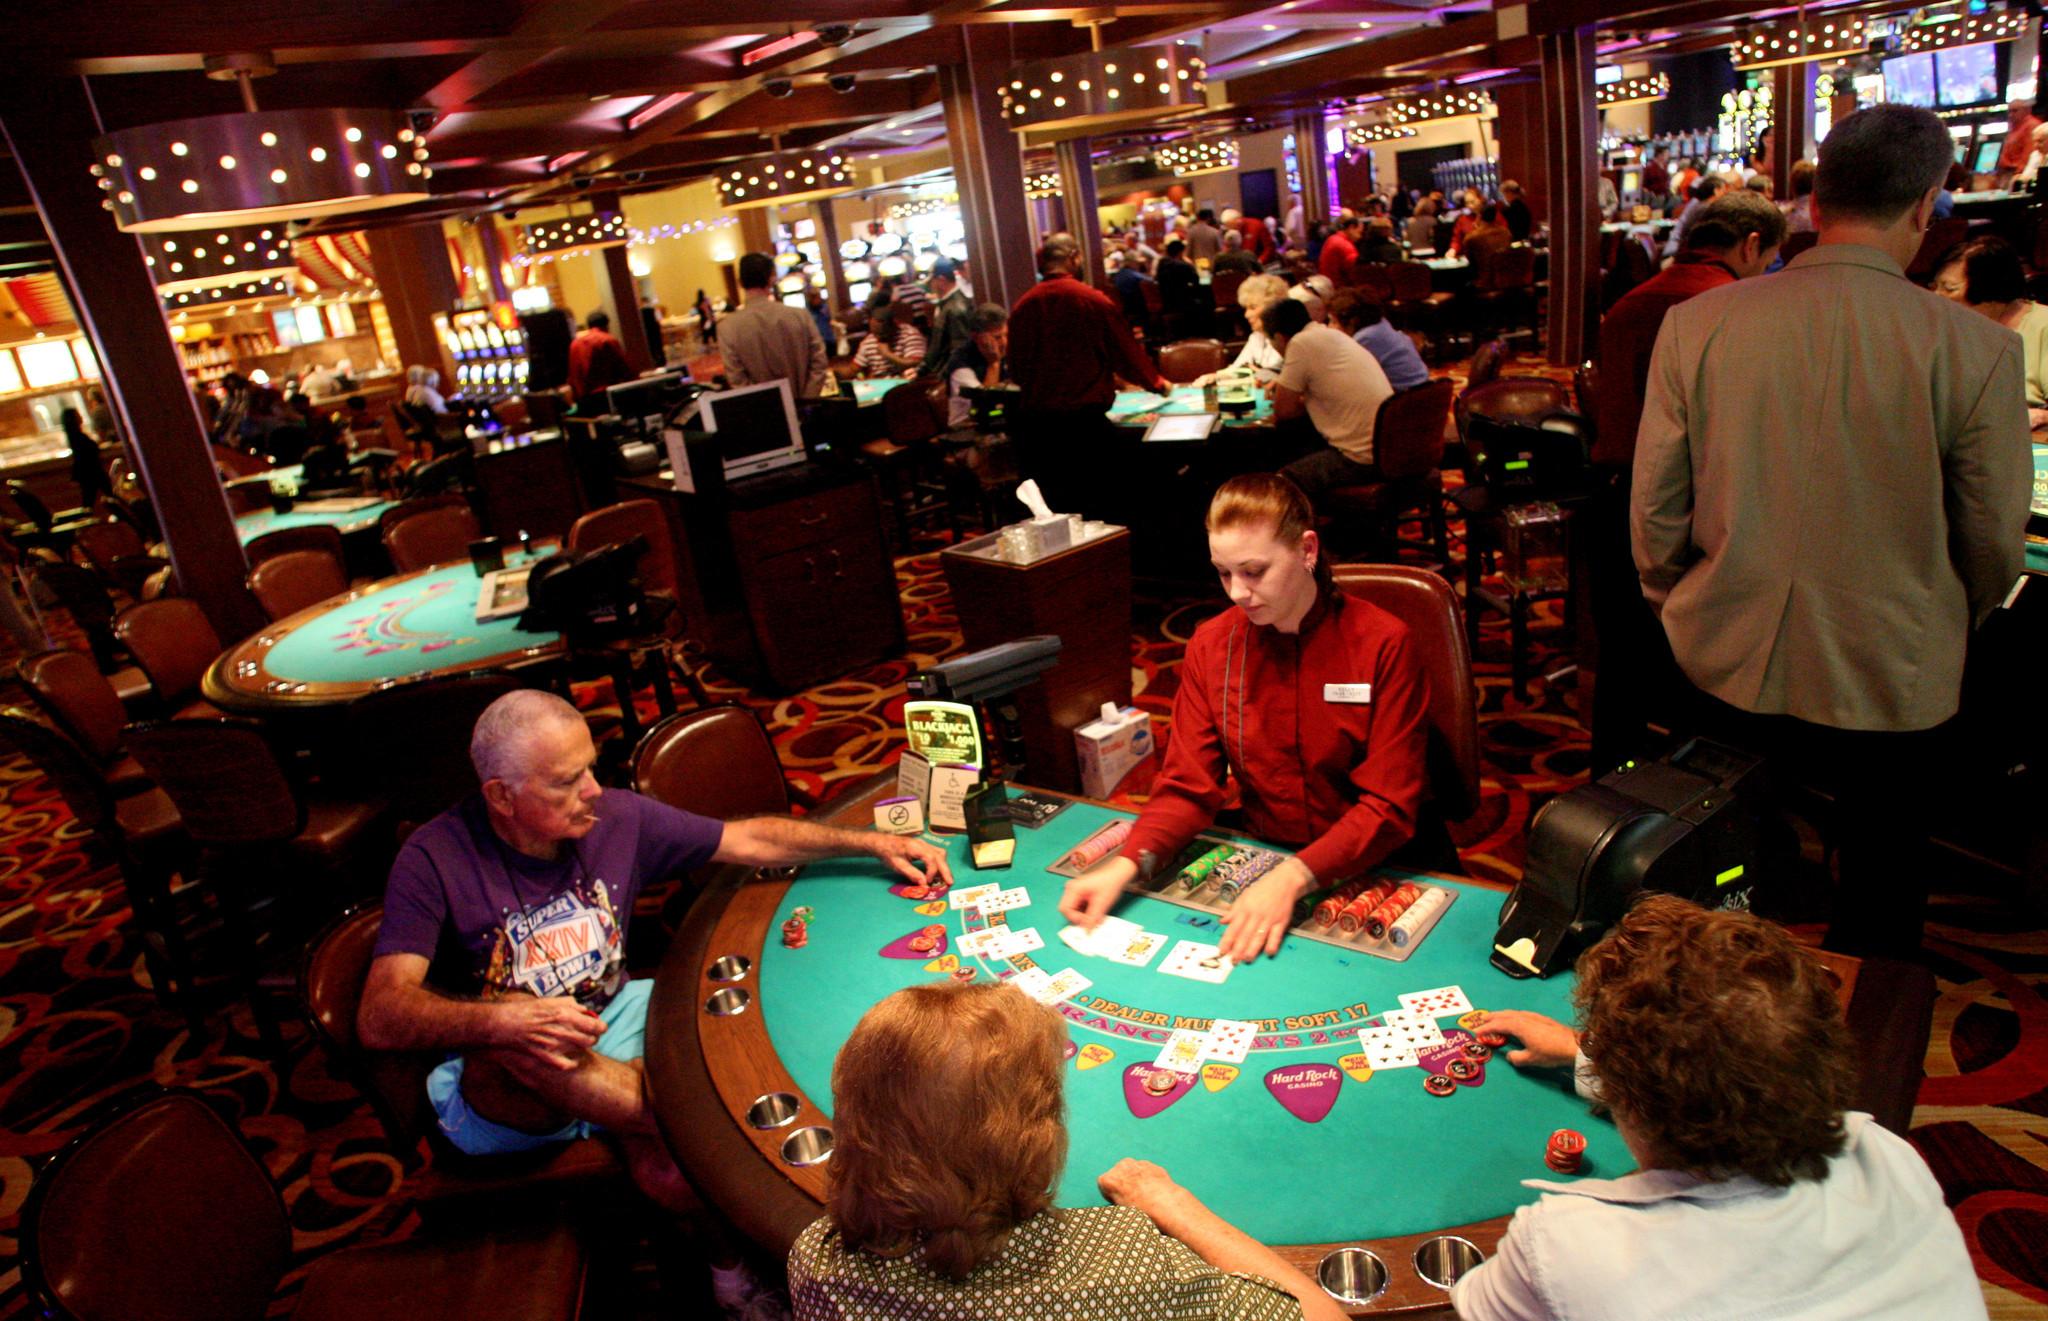 Seminole hard rock casino employment online casino games 3 card poker